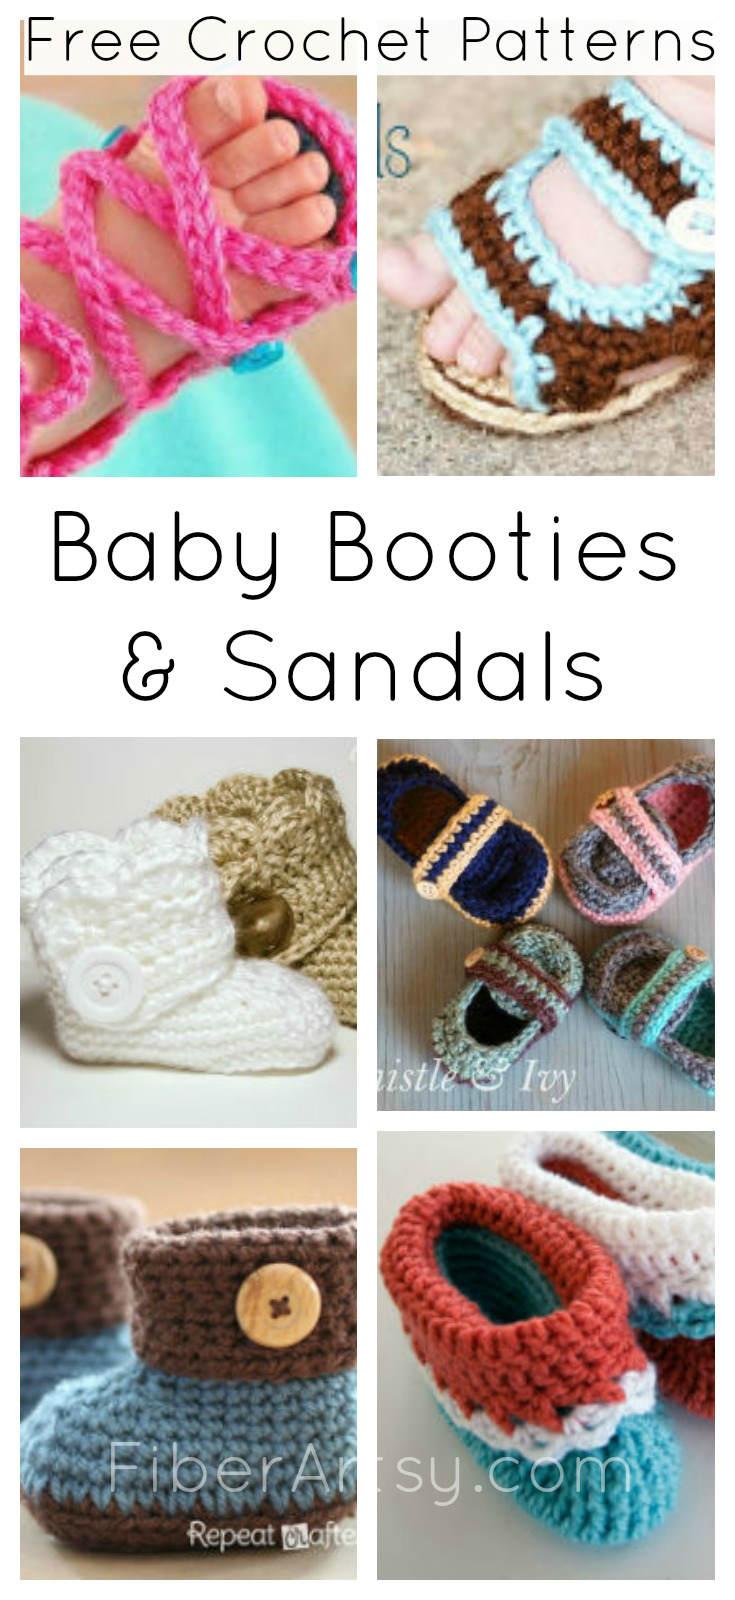 Baby Shoe Booty and Sandal Free Crochet Patterns FiberArtsy.com